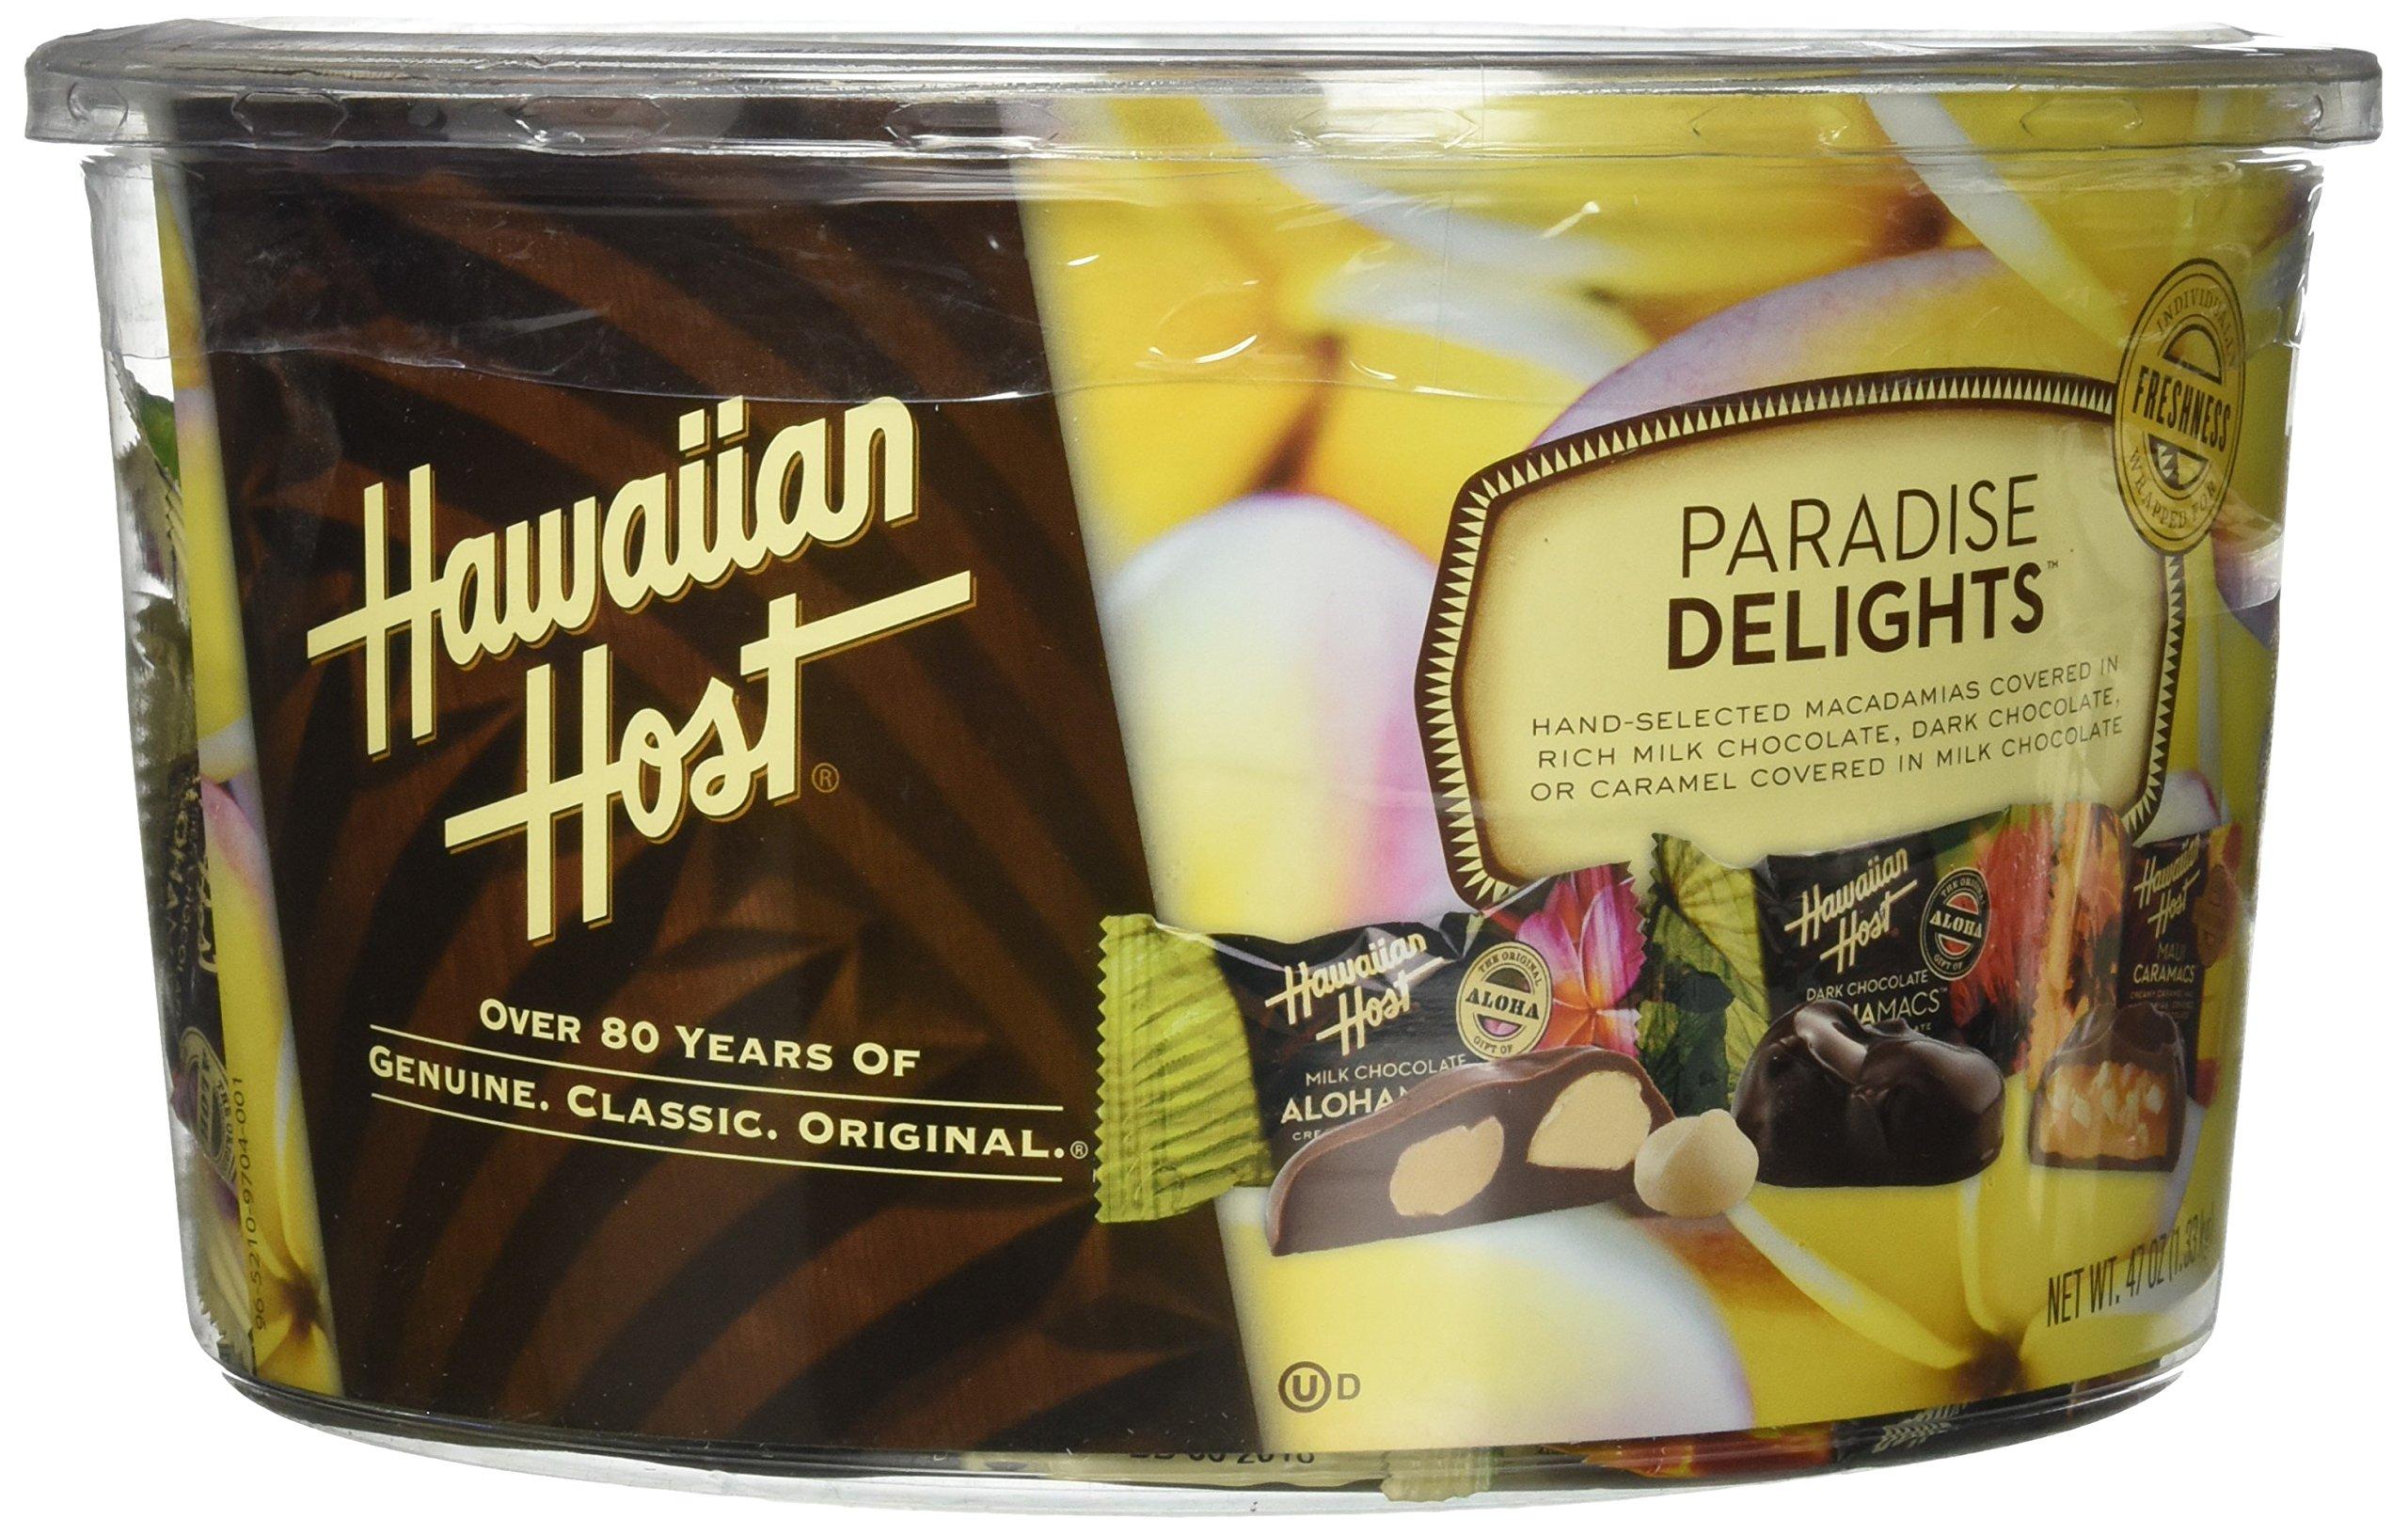 Paradise Delights Chocolate Covered Macadamia Nut Variety Pack 47 oz (Maui Caramacs, Dark Chocolate Aloha Macs, Milk Chocolate Aloha Macs) by Hawaiian Host